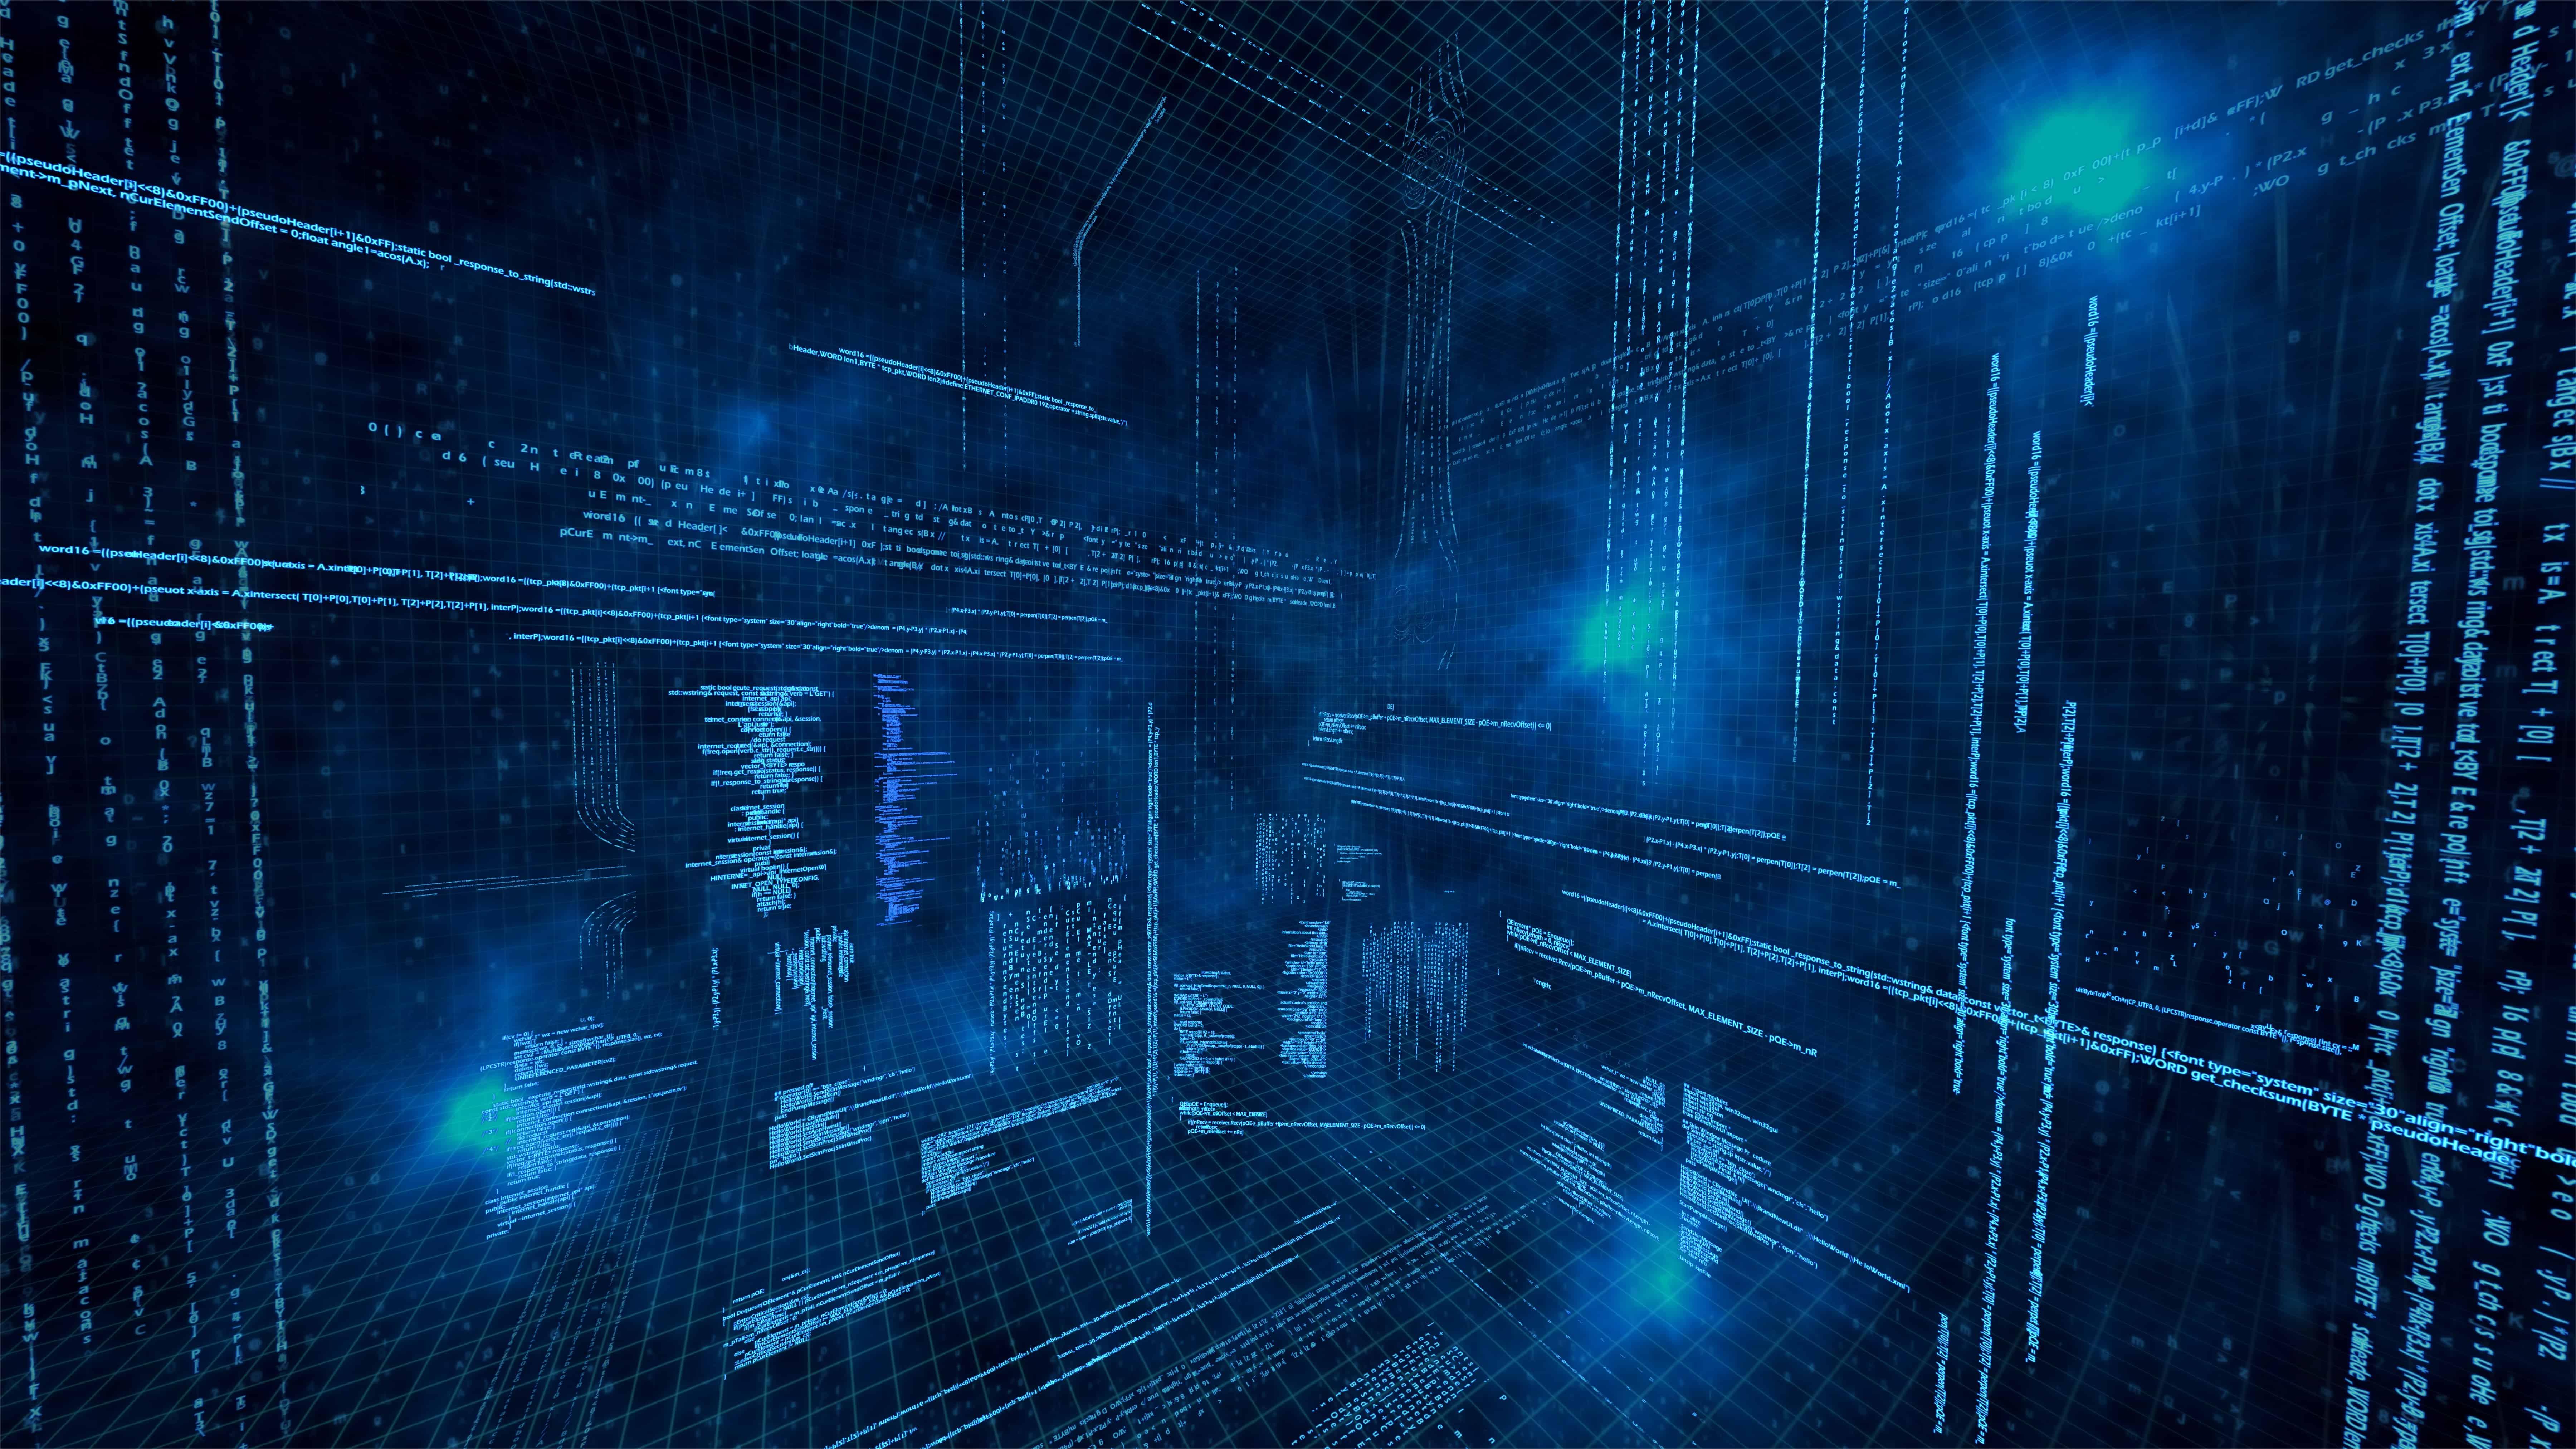 Illustration of virtual data